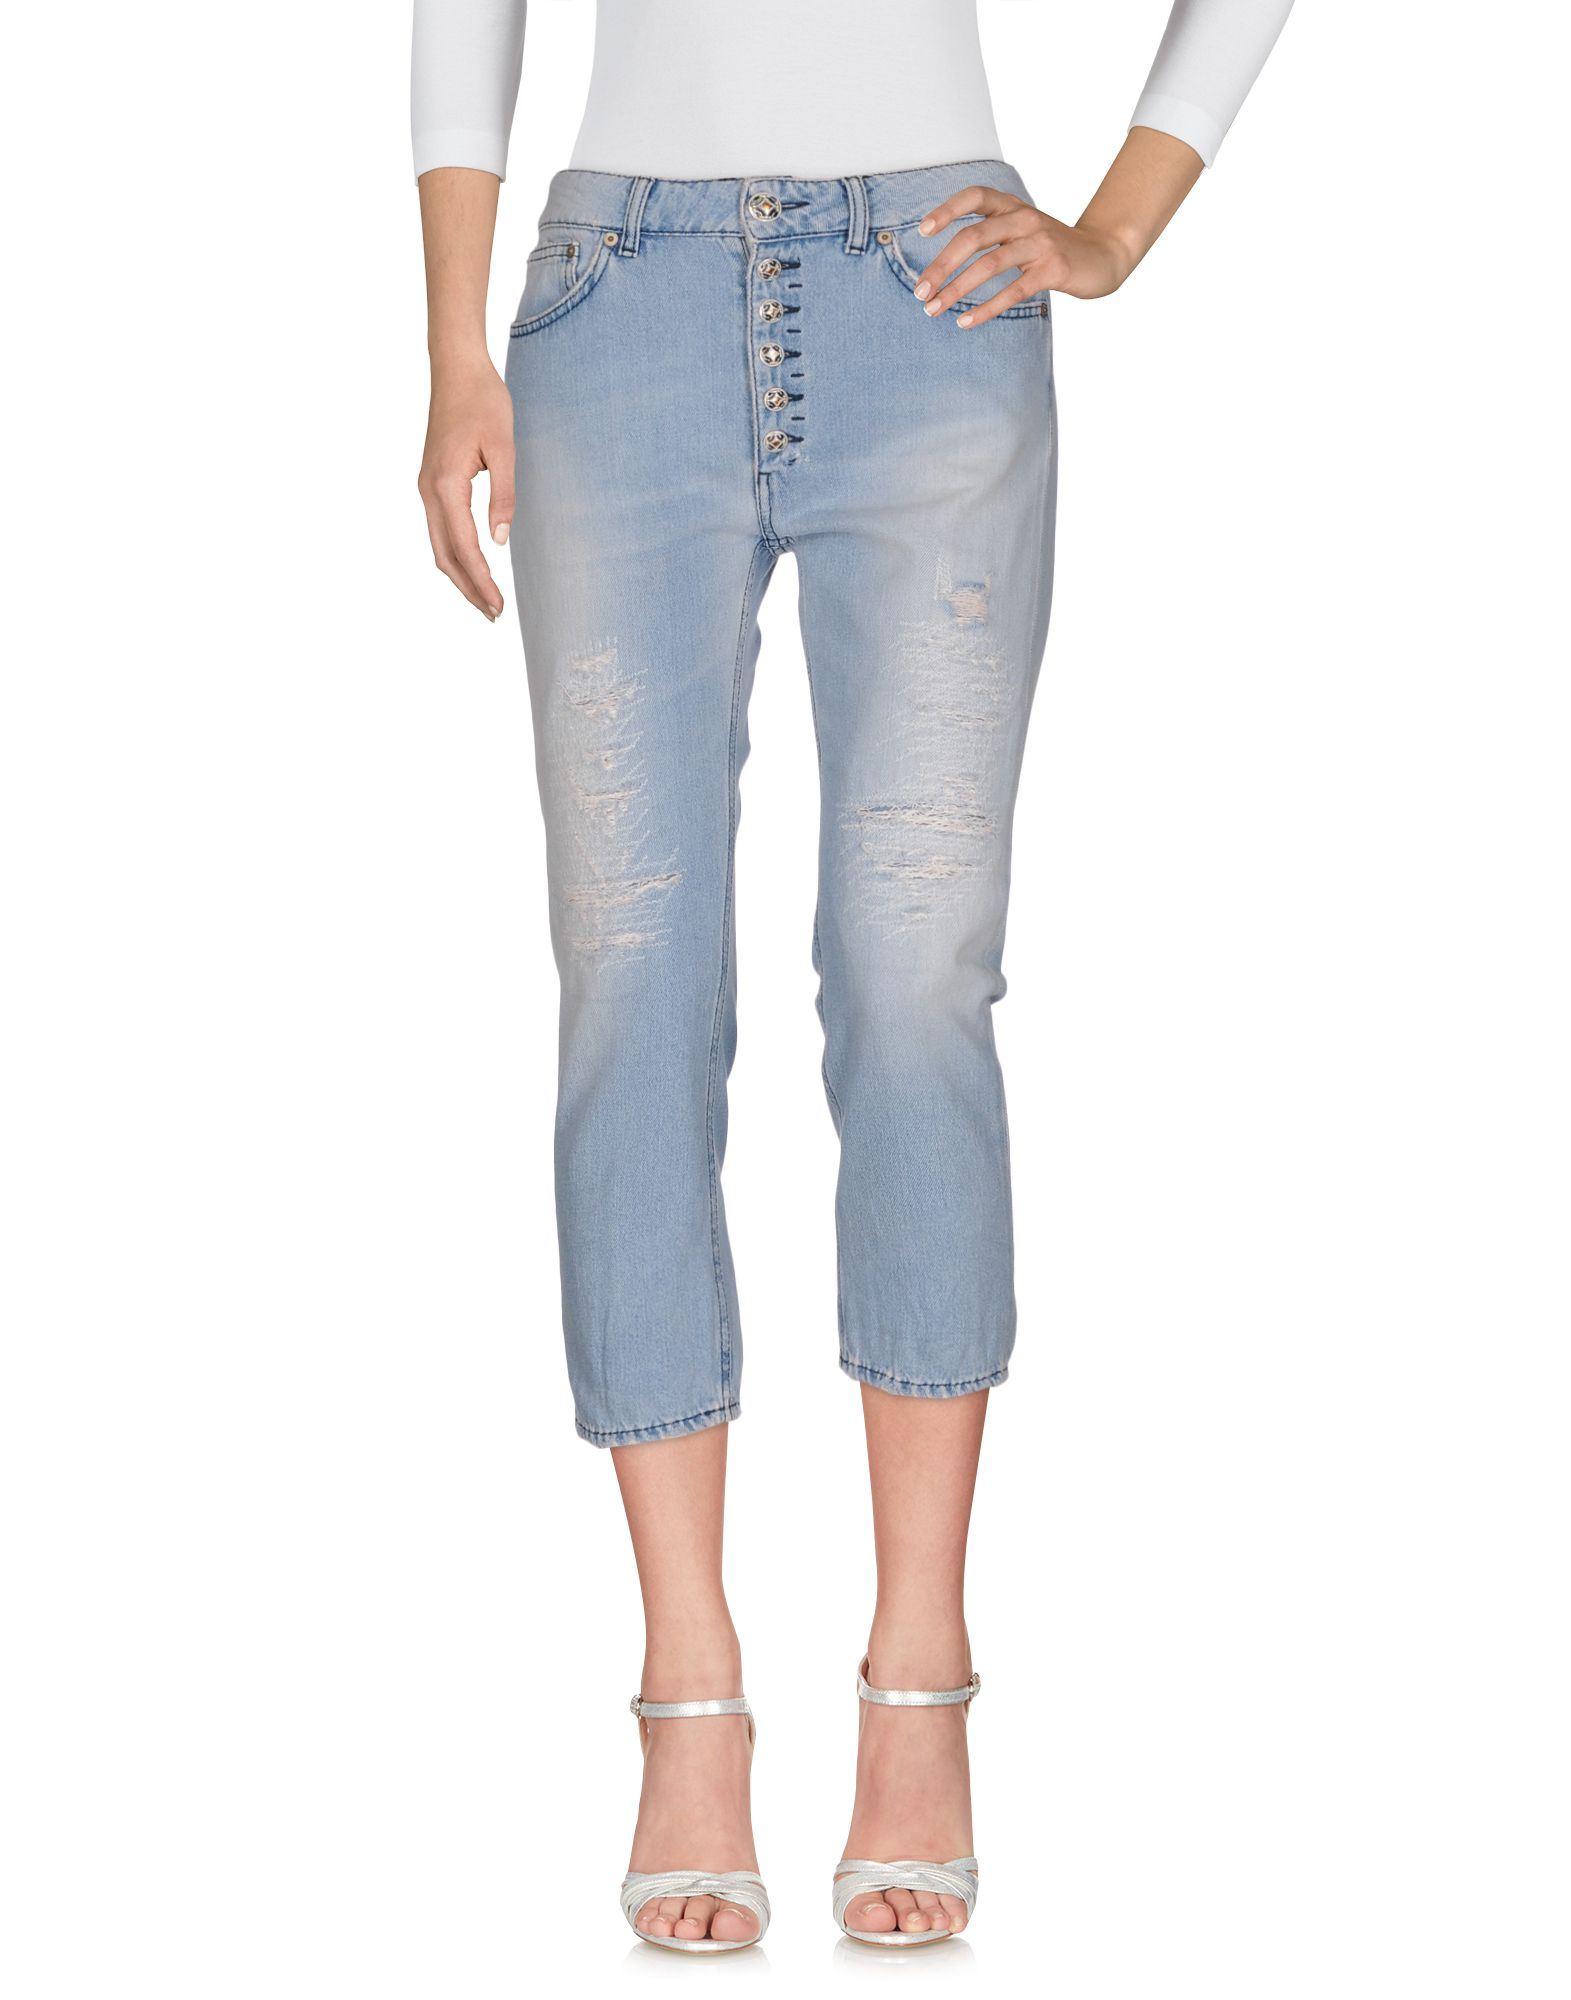 Pantaloni Jeans Dondup Donna - Acquista online su JSxIHgL1